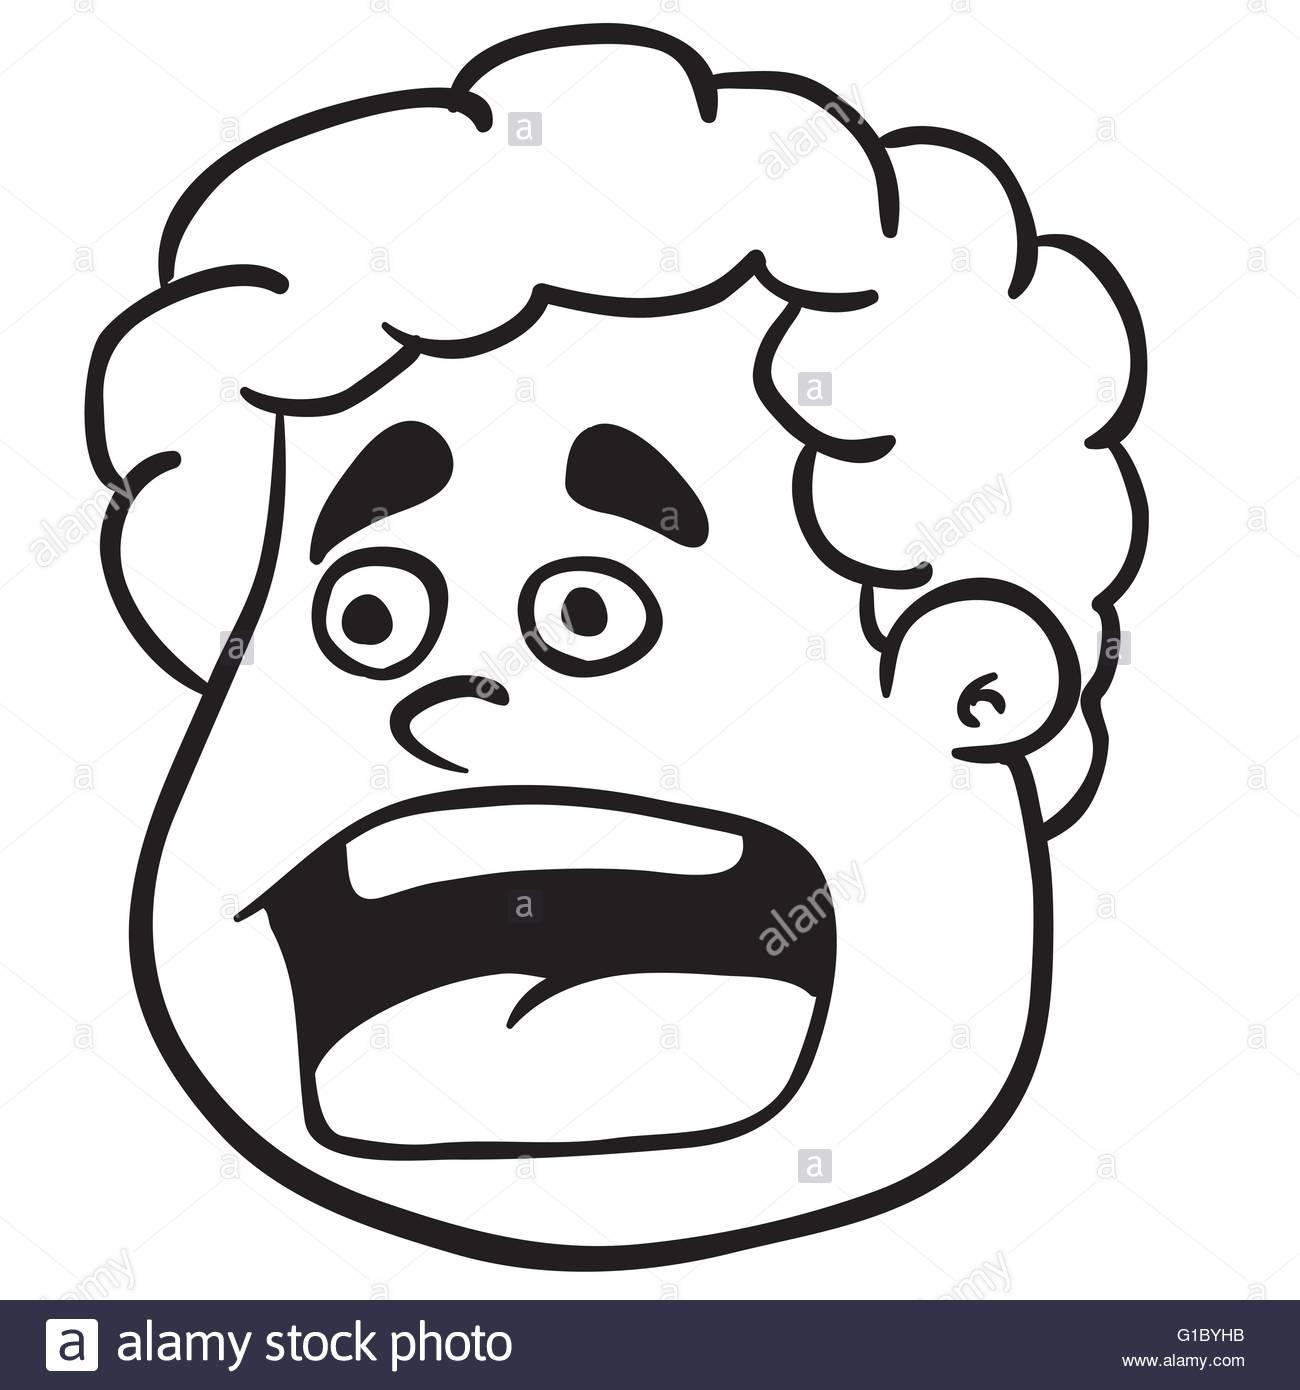 1300x1390 Simple Black And White Fat Boy Scream Cartoon Stock Vector Art